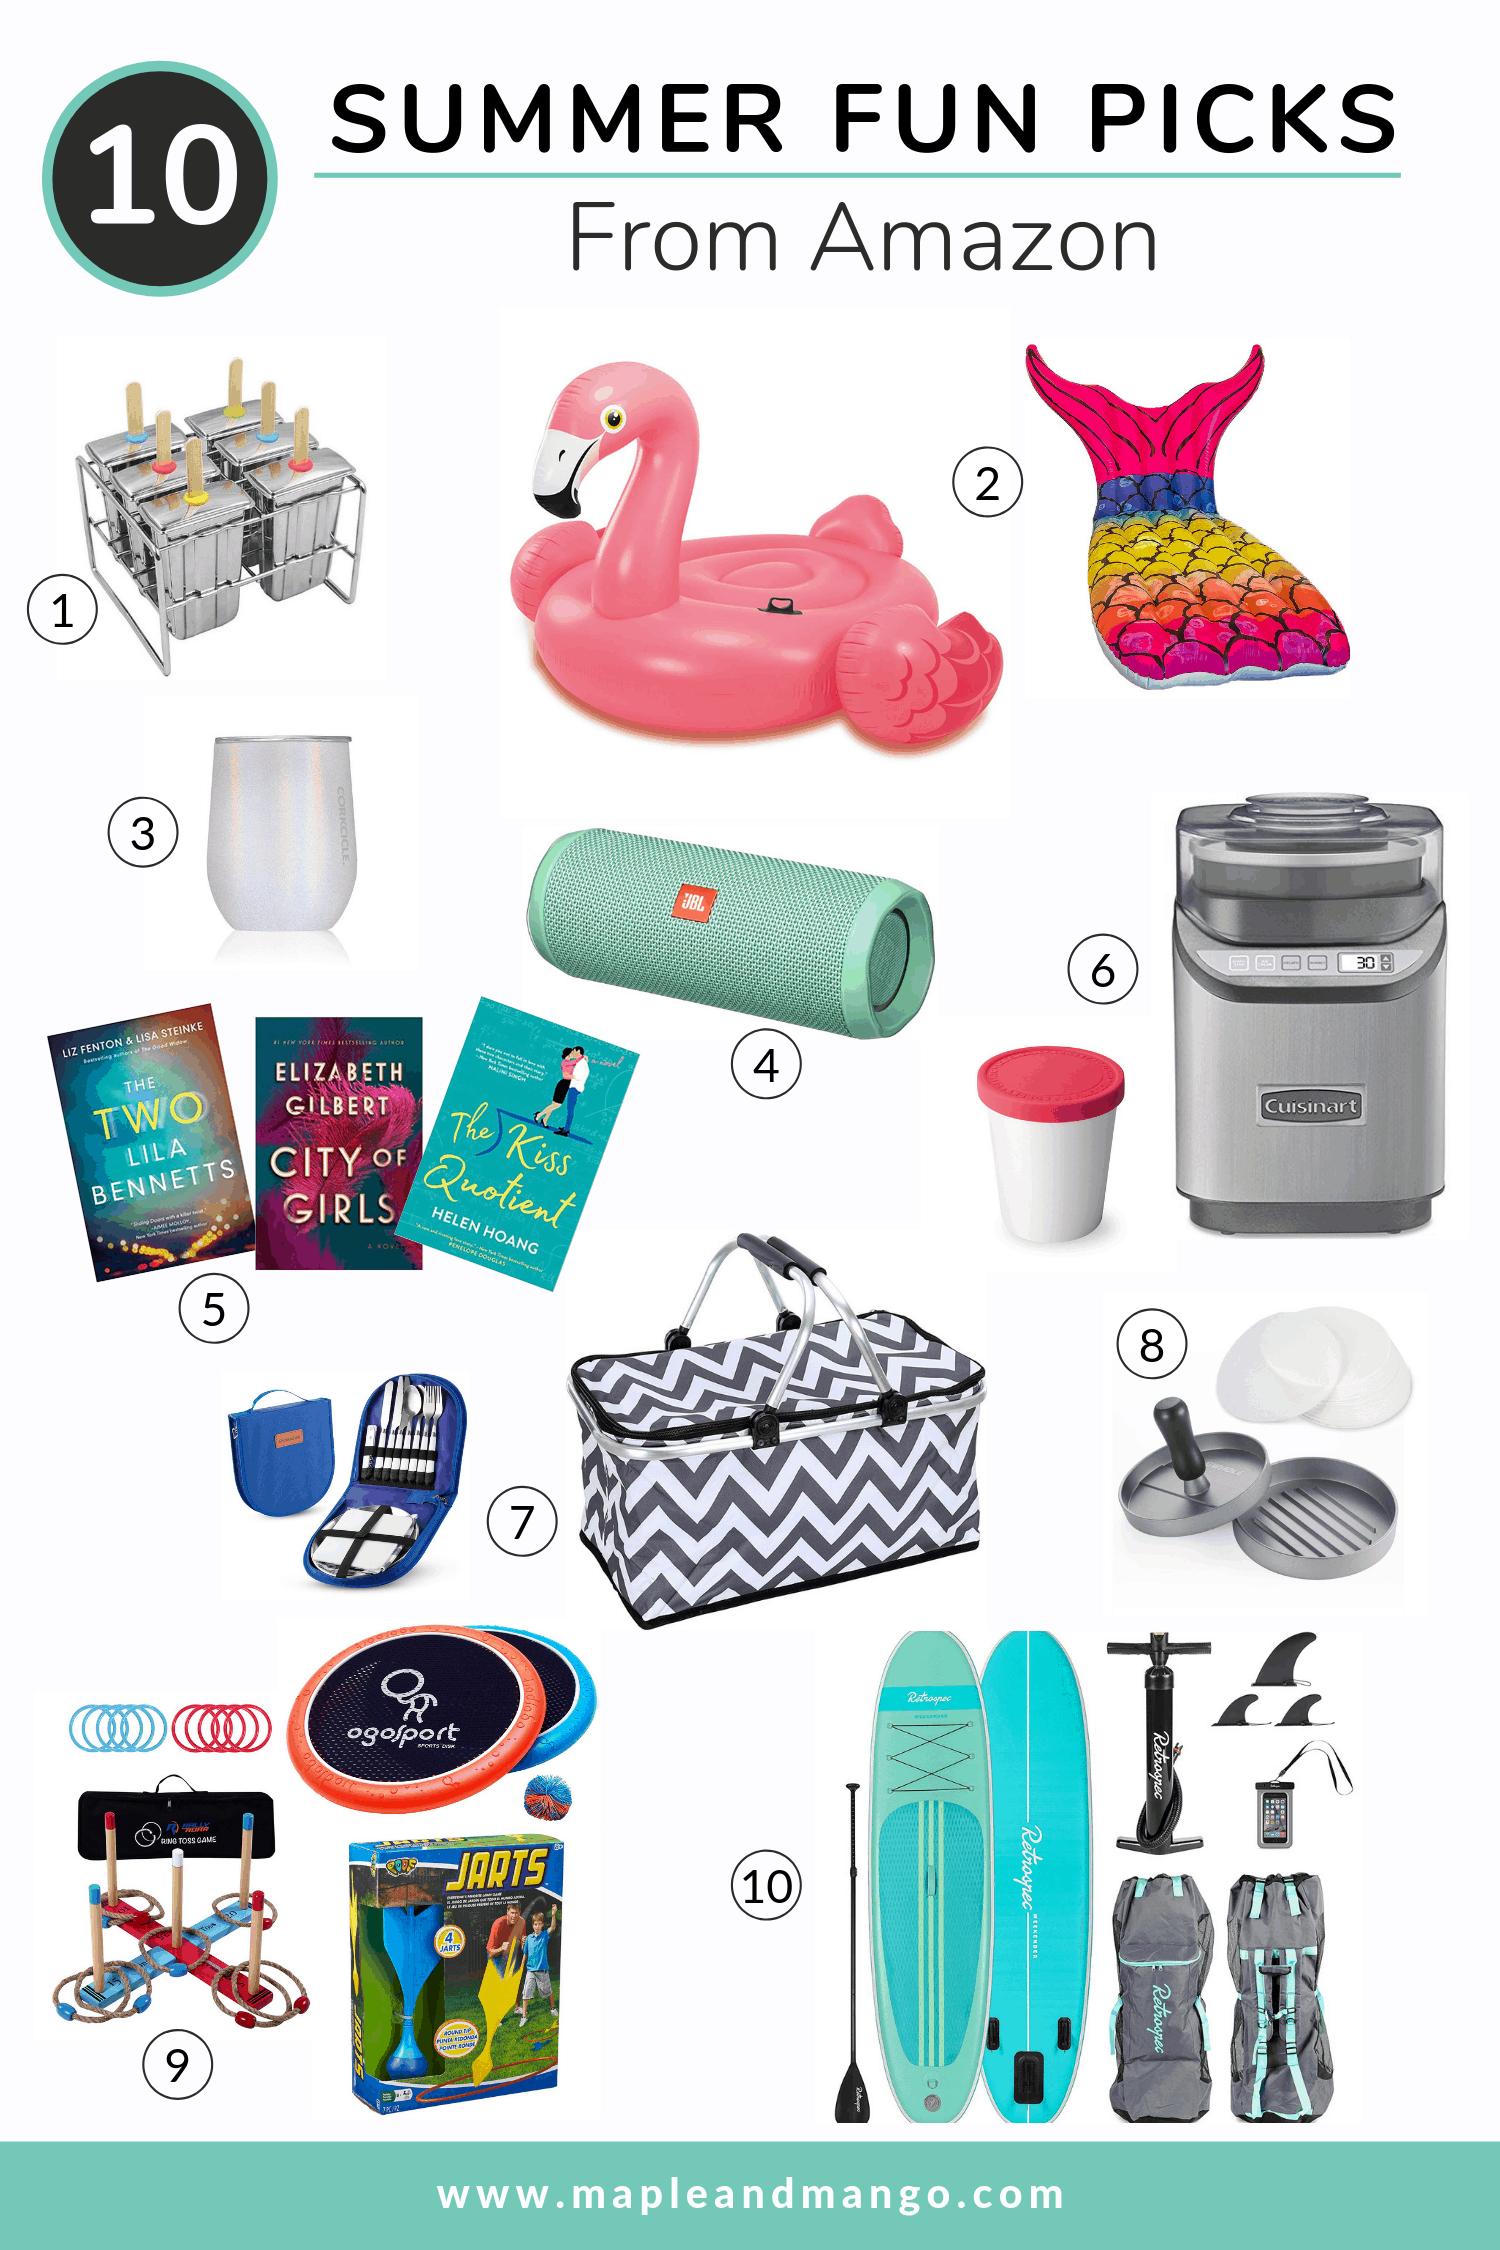 Pinterest Image featuring 10 summer fun picks from Amazon